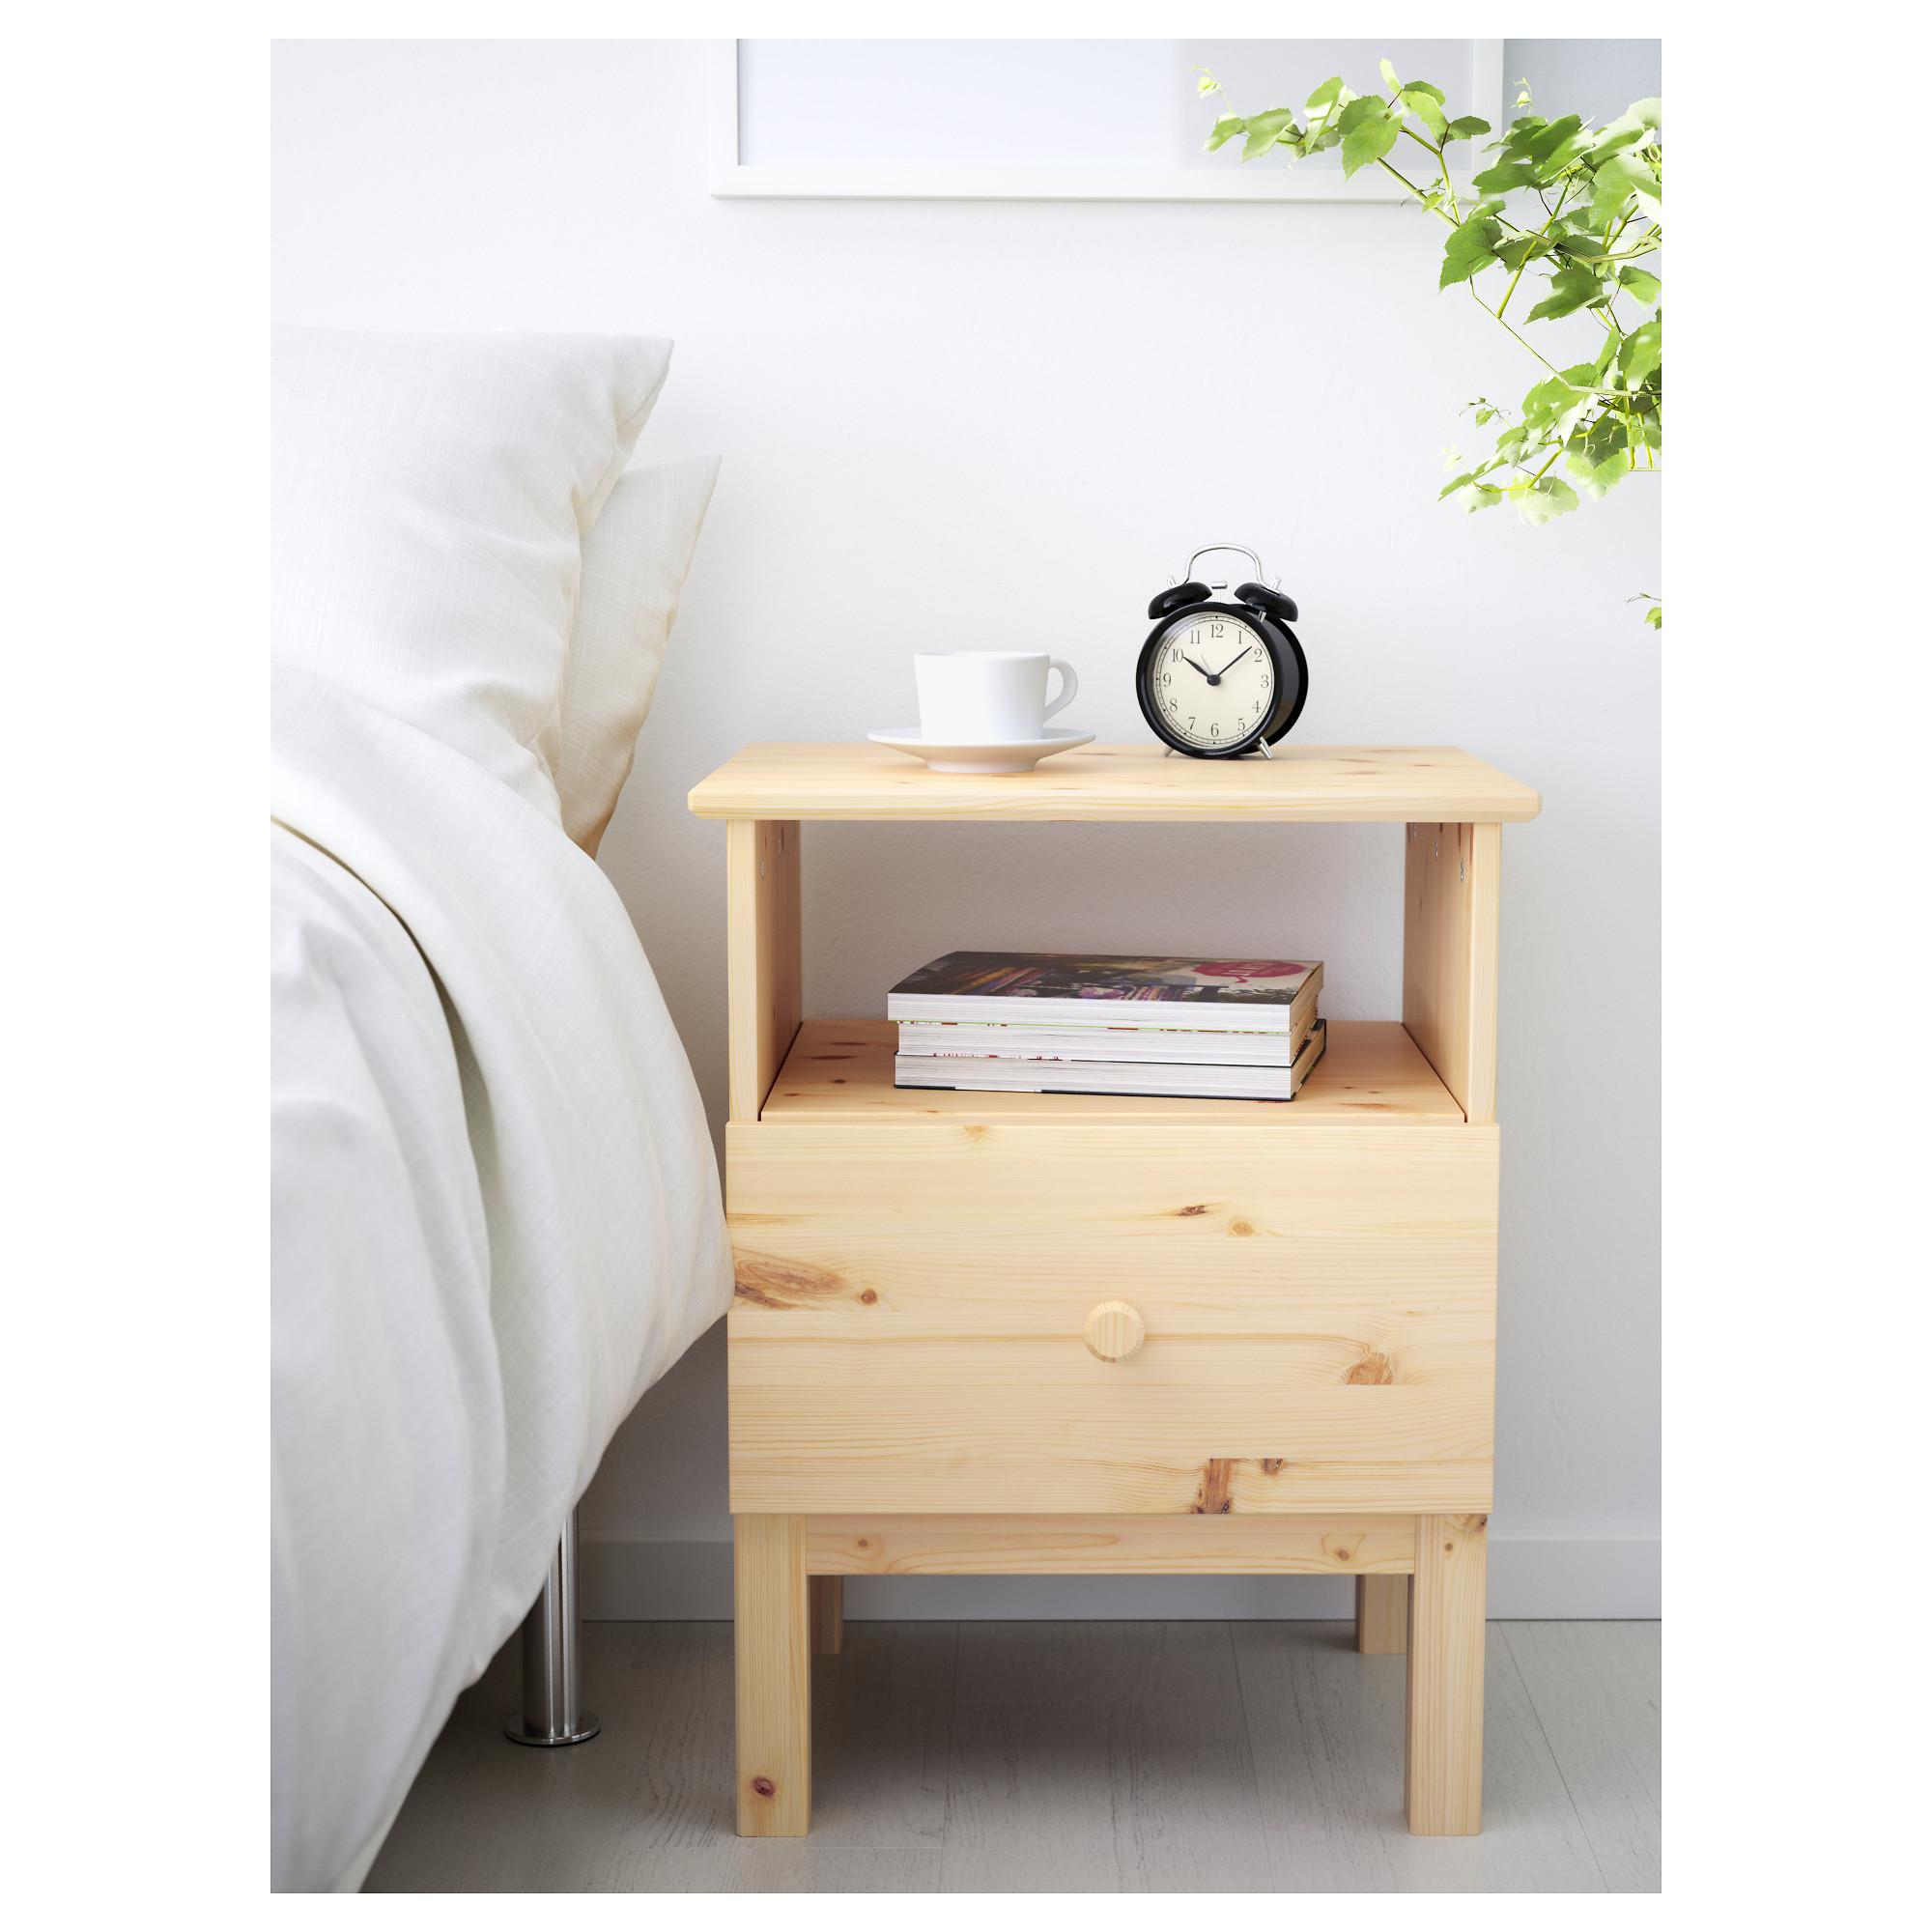 ikea tarva bedside table made of solid wood, which is a hardwearing IJBDHAA